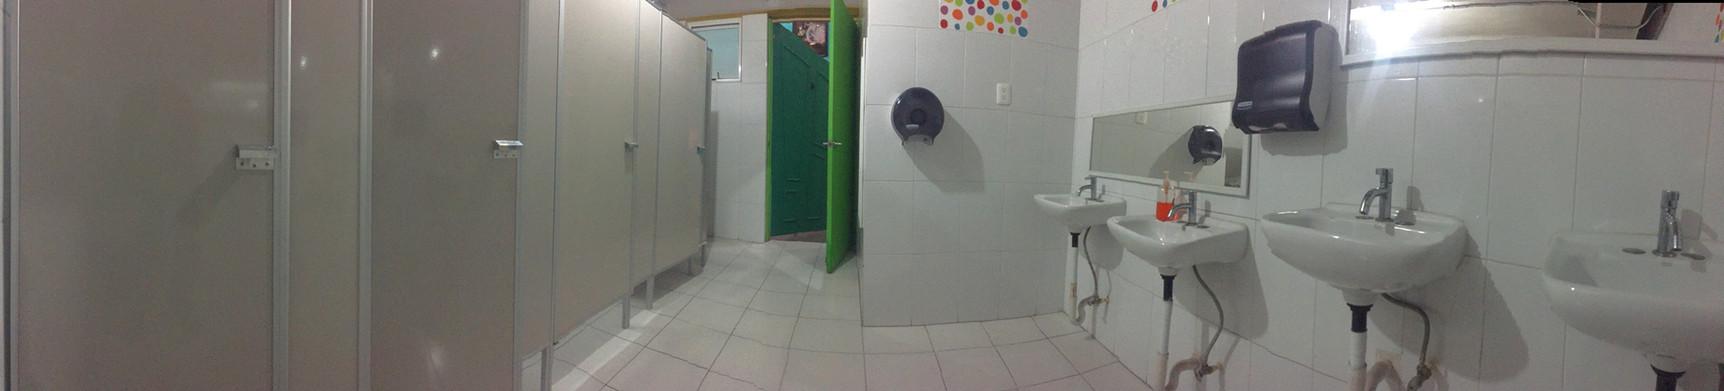 01_baños_mujeres.jpg